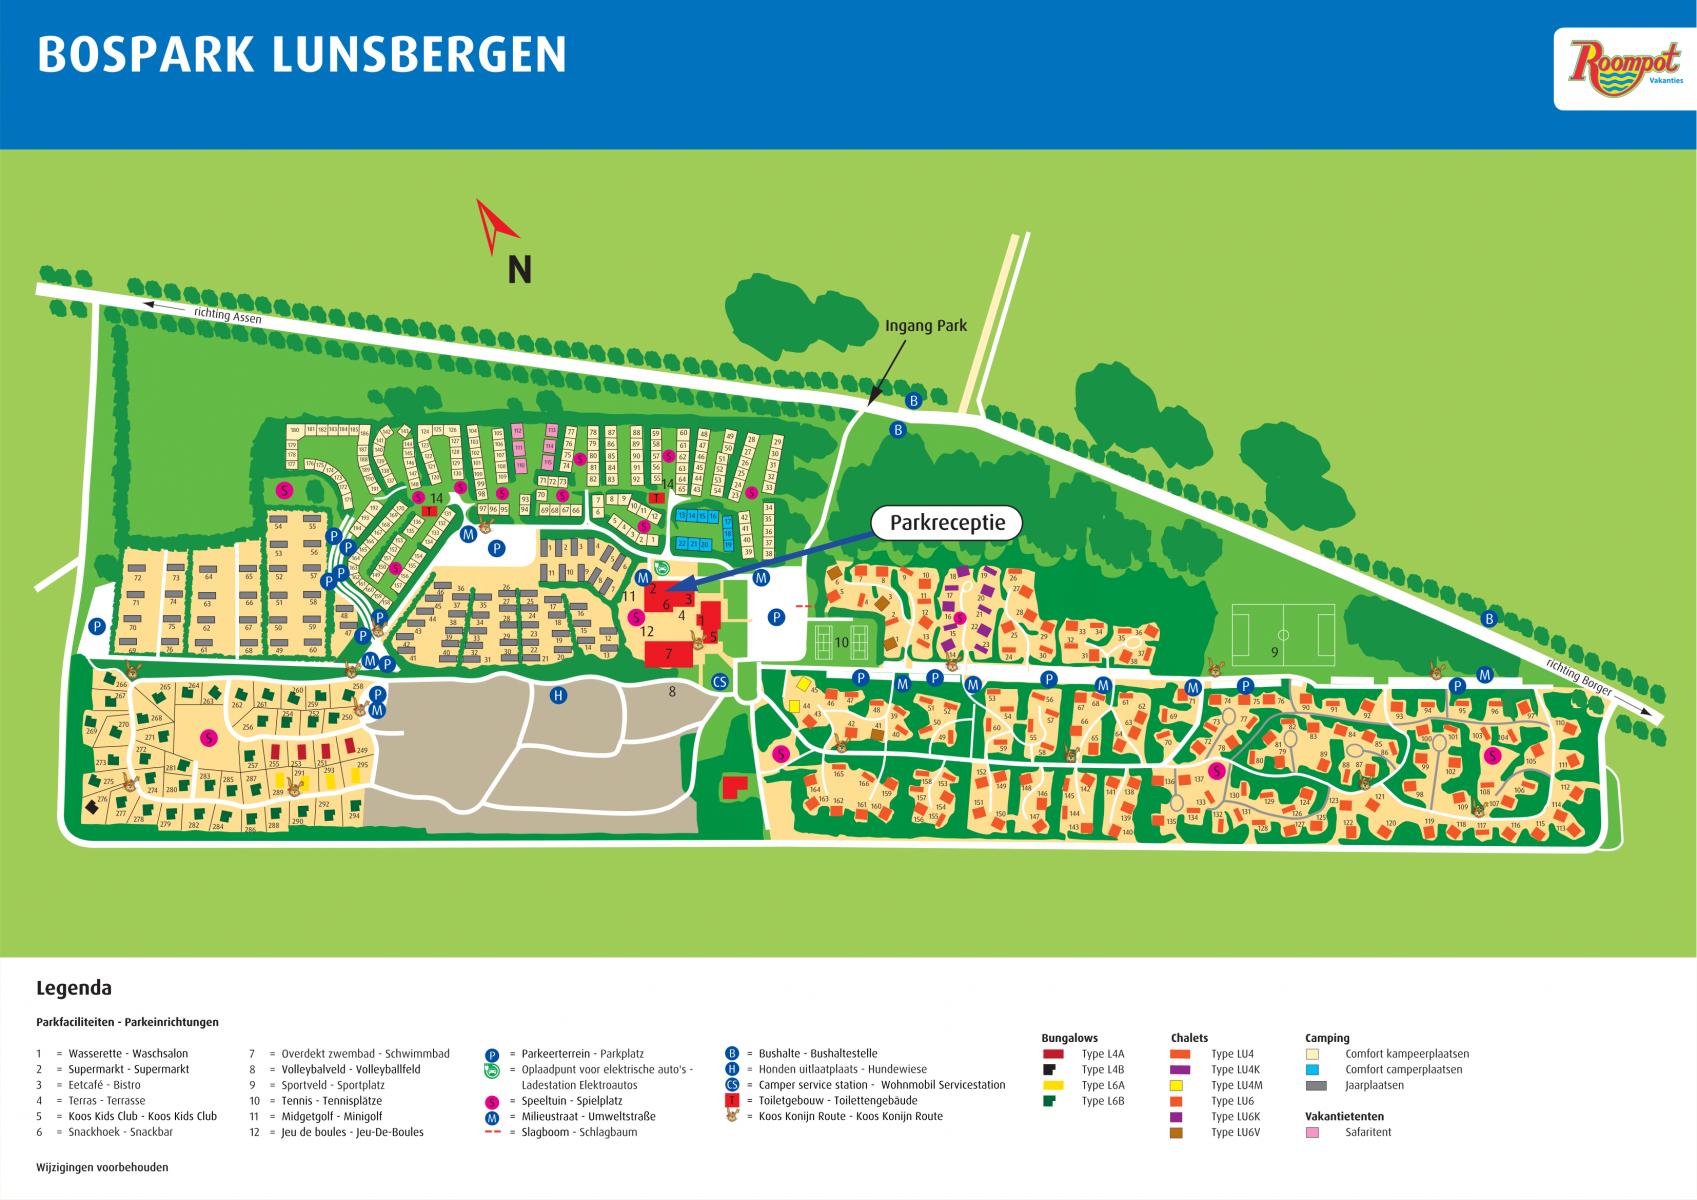 Roompot Bospark Lunsbergen